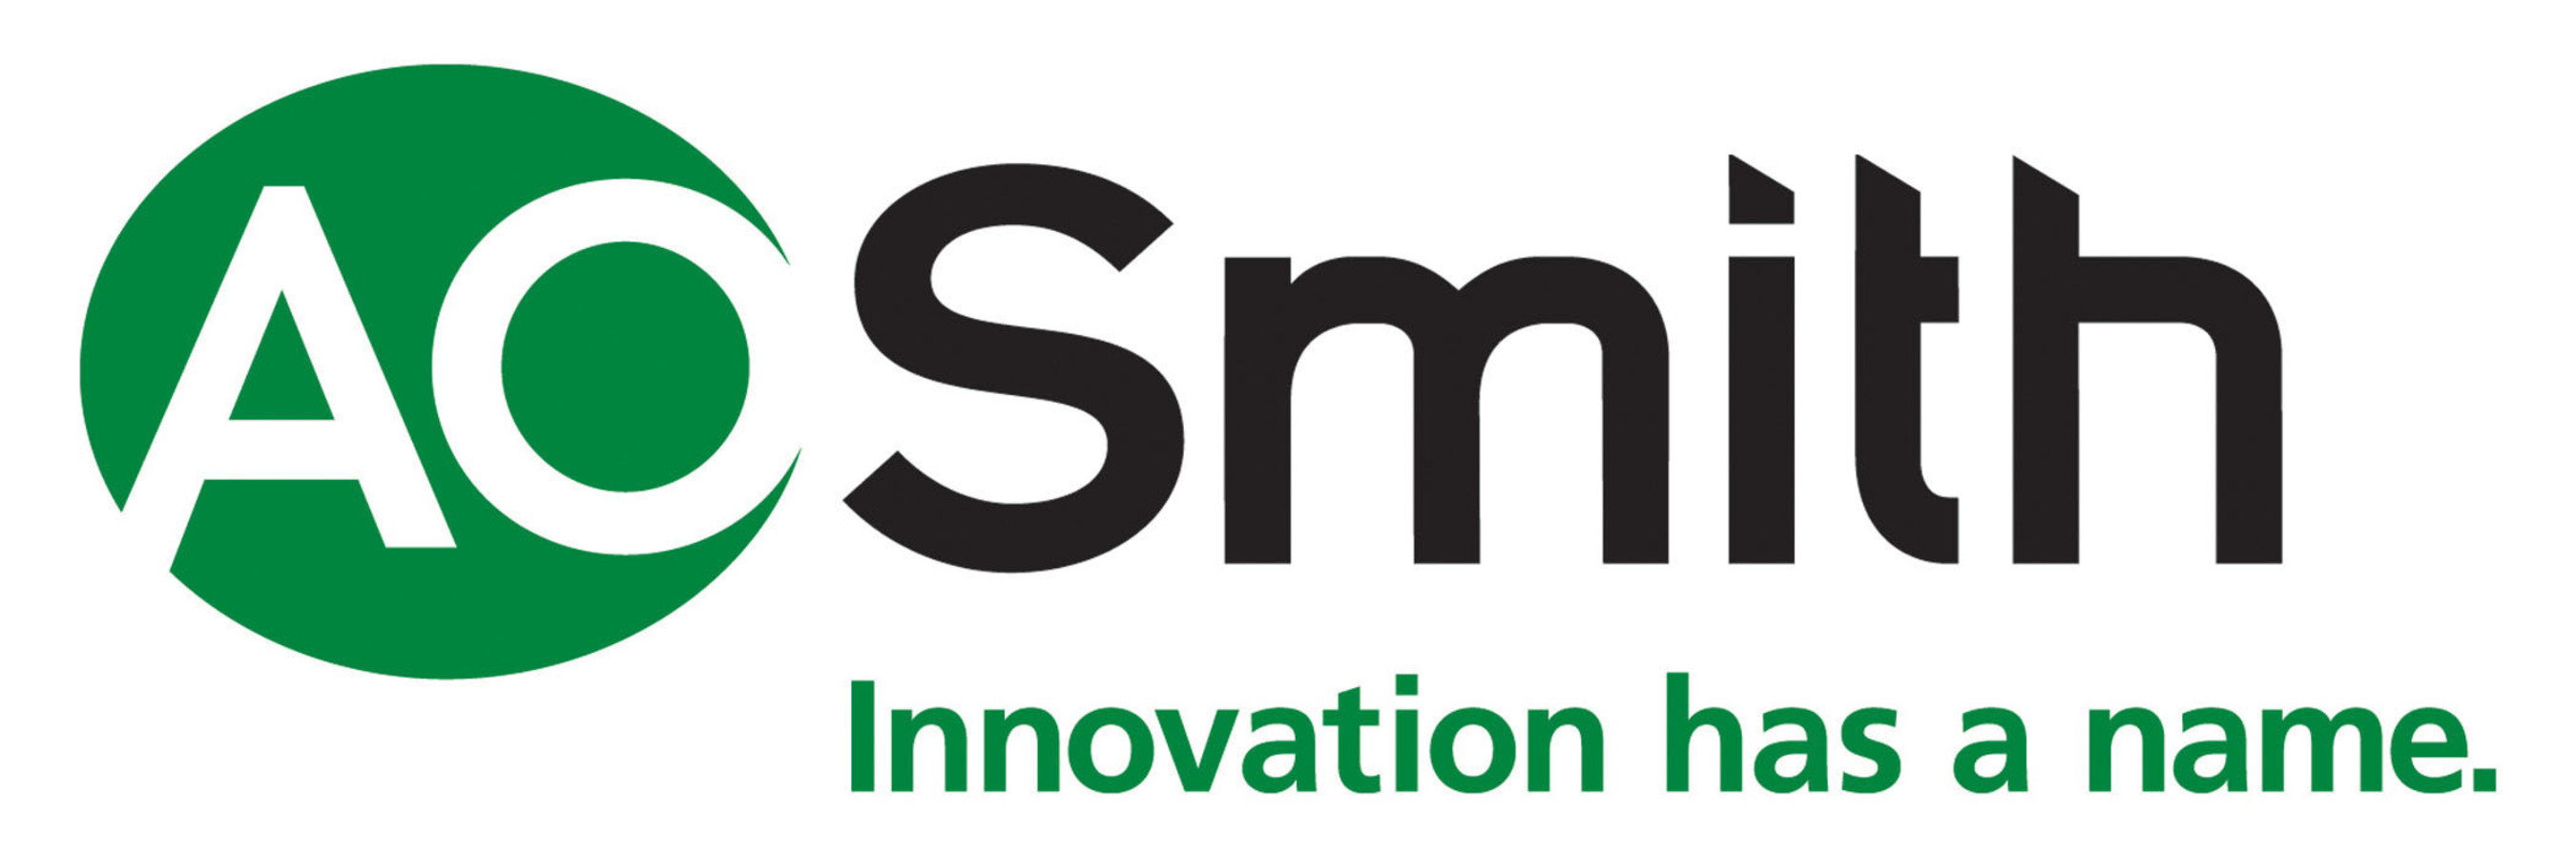 A. O. Smith Corporation logo